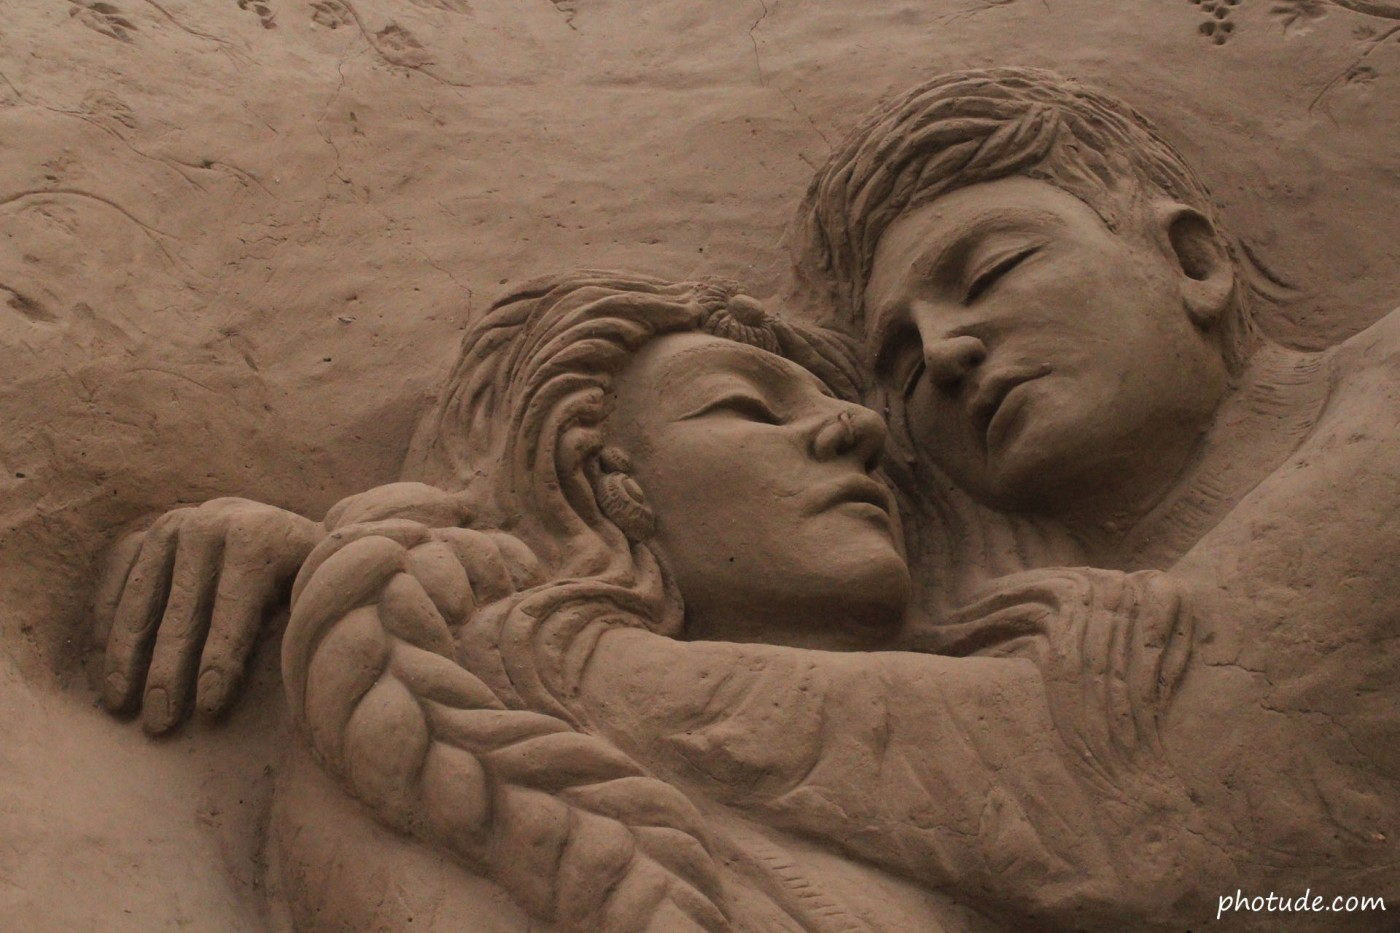 Sand Art of Romantic Couple